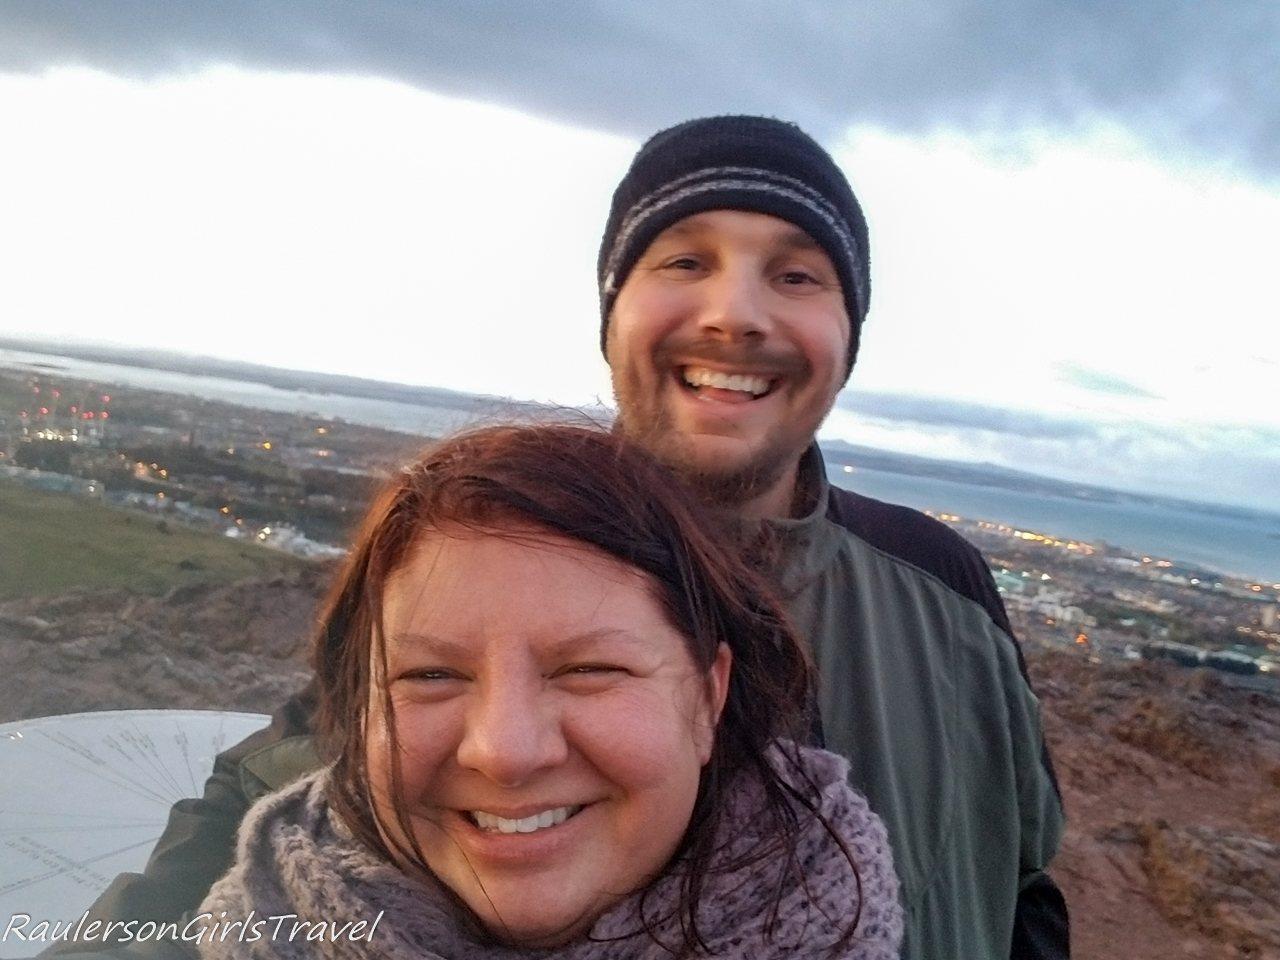 Heather and Skye on top of Arthur's Seat in Edinburgh